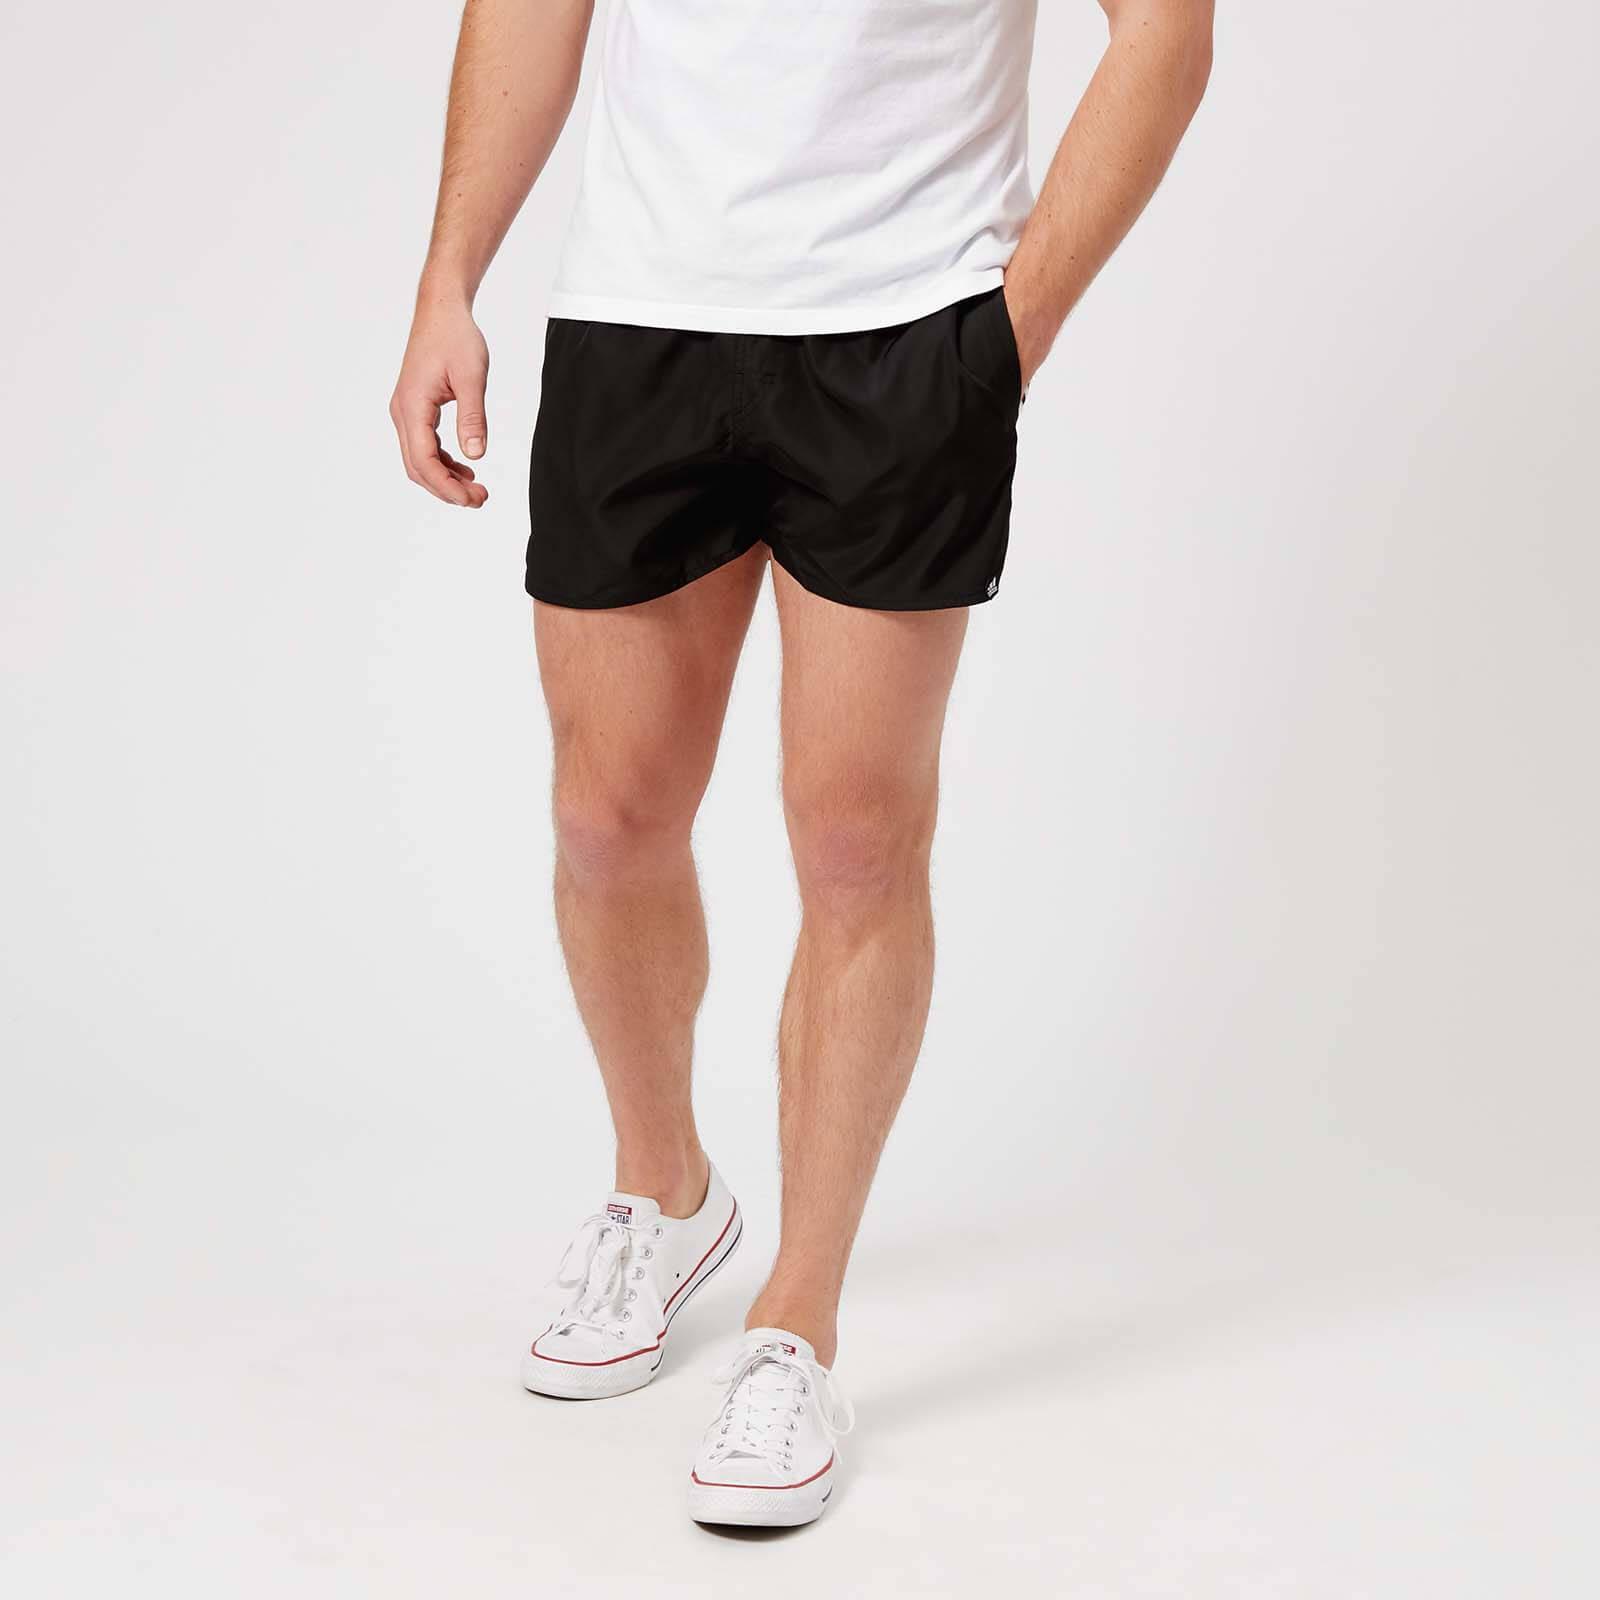 5cc92a0993 Lyst - adidas 3 Stripe Vsl Swim Shorts in Black for Men